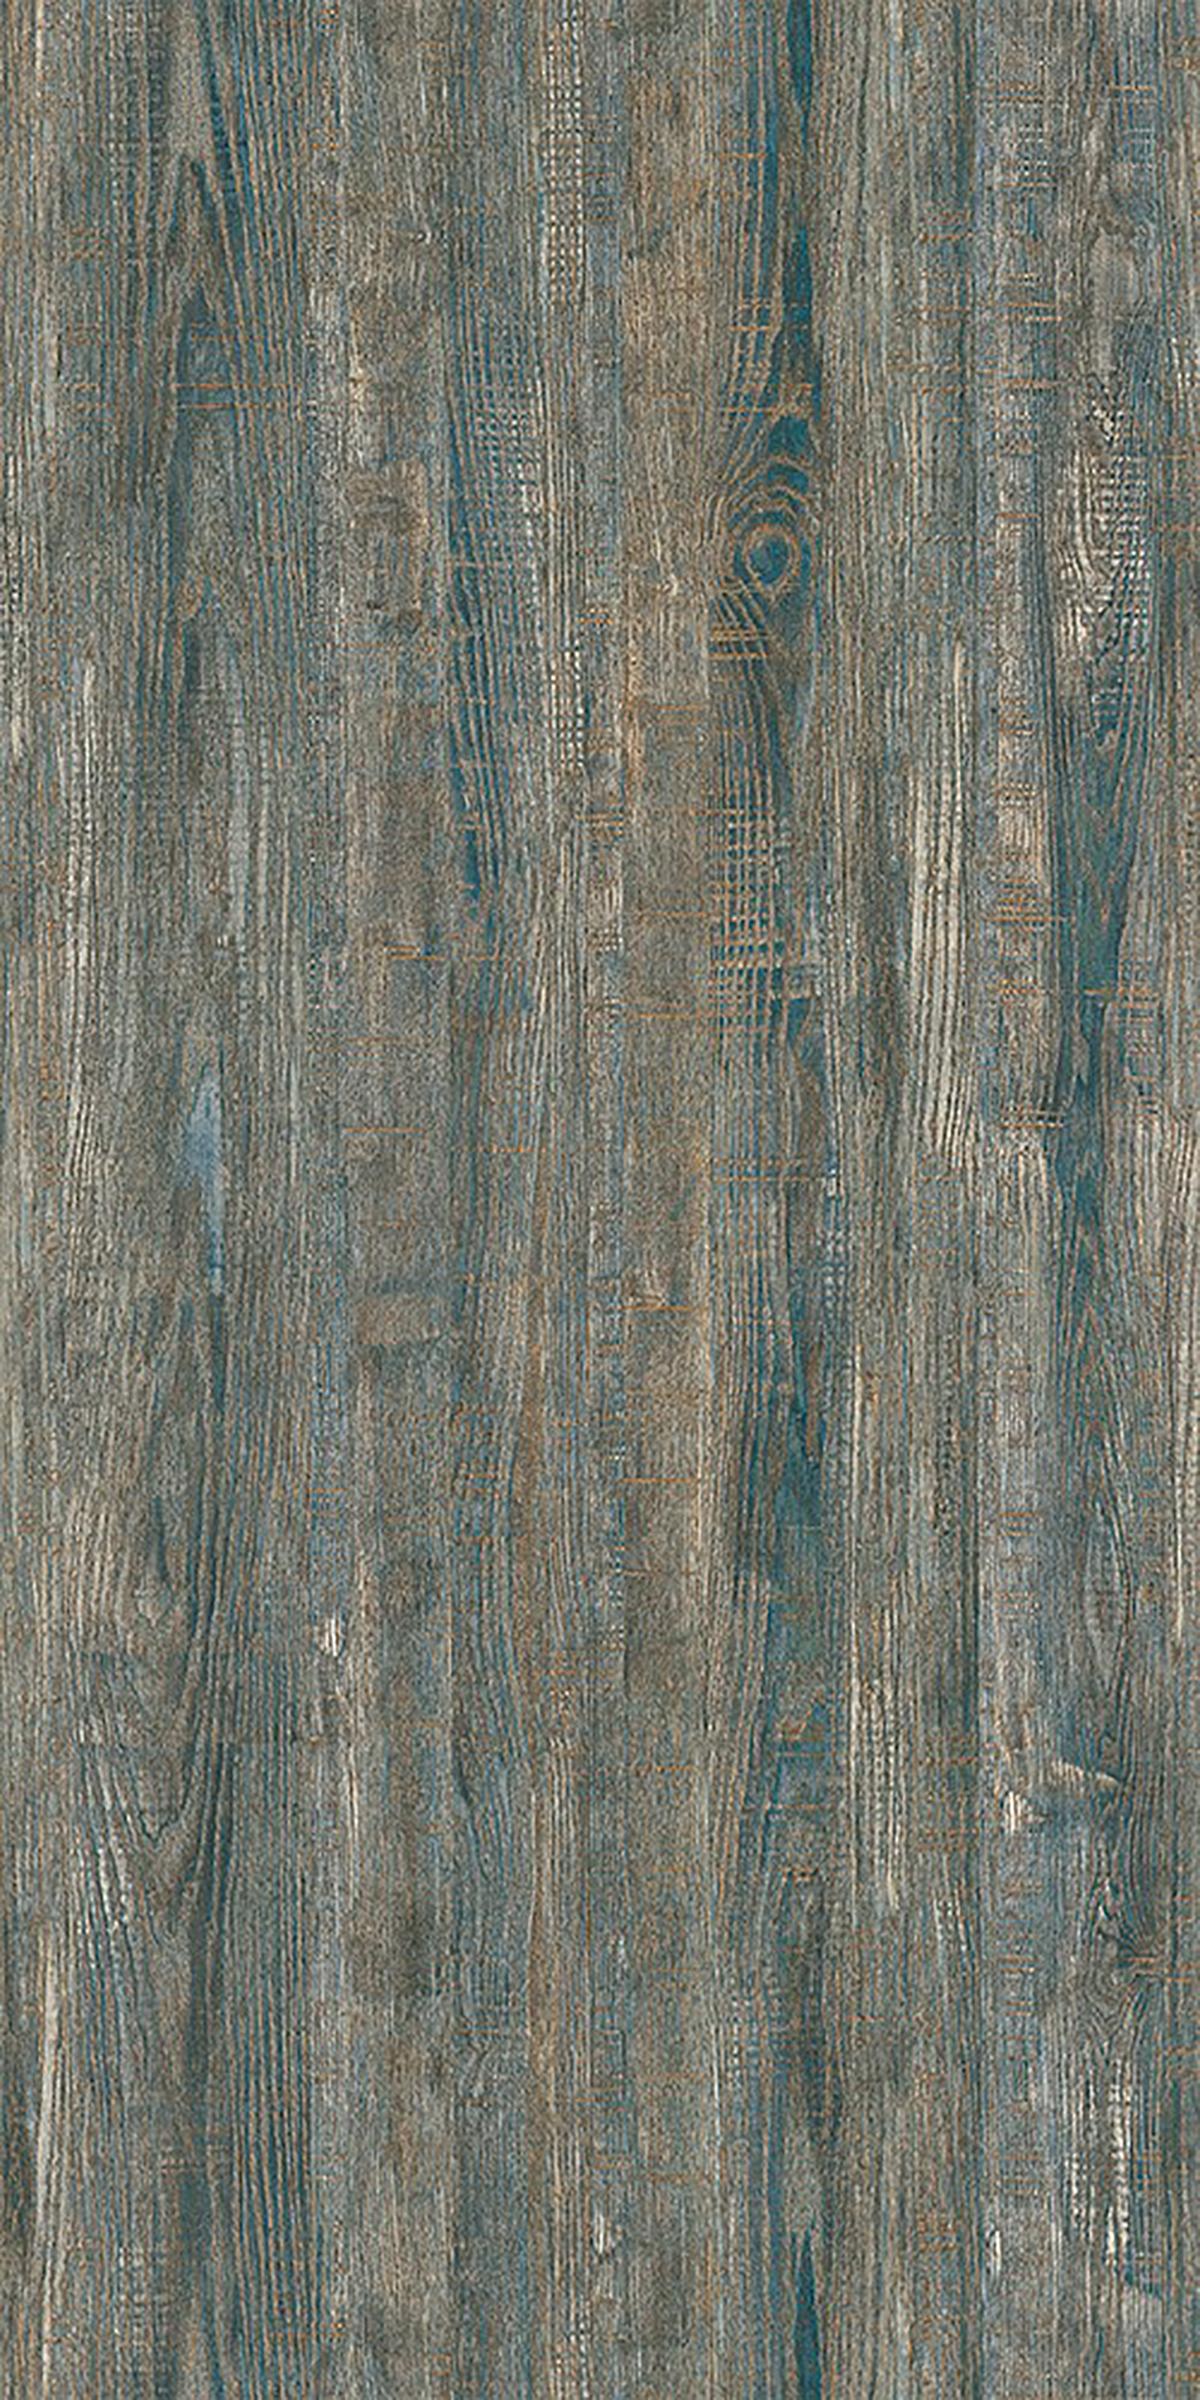 783 Blue Wood Laminates Decorative Laminates Cladding Interior Grade Compact Hpl Cladding Exterior Grade Compact Hpl